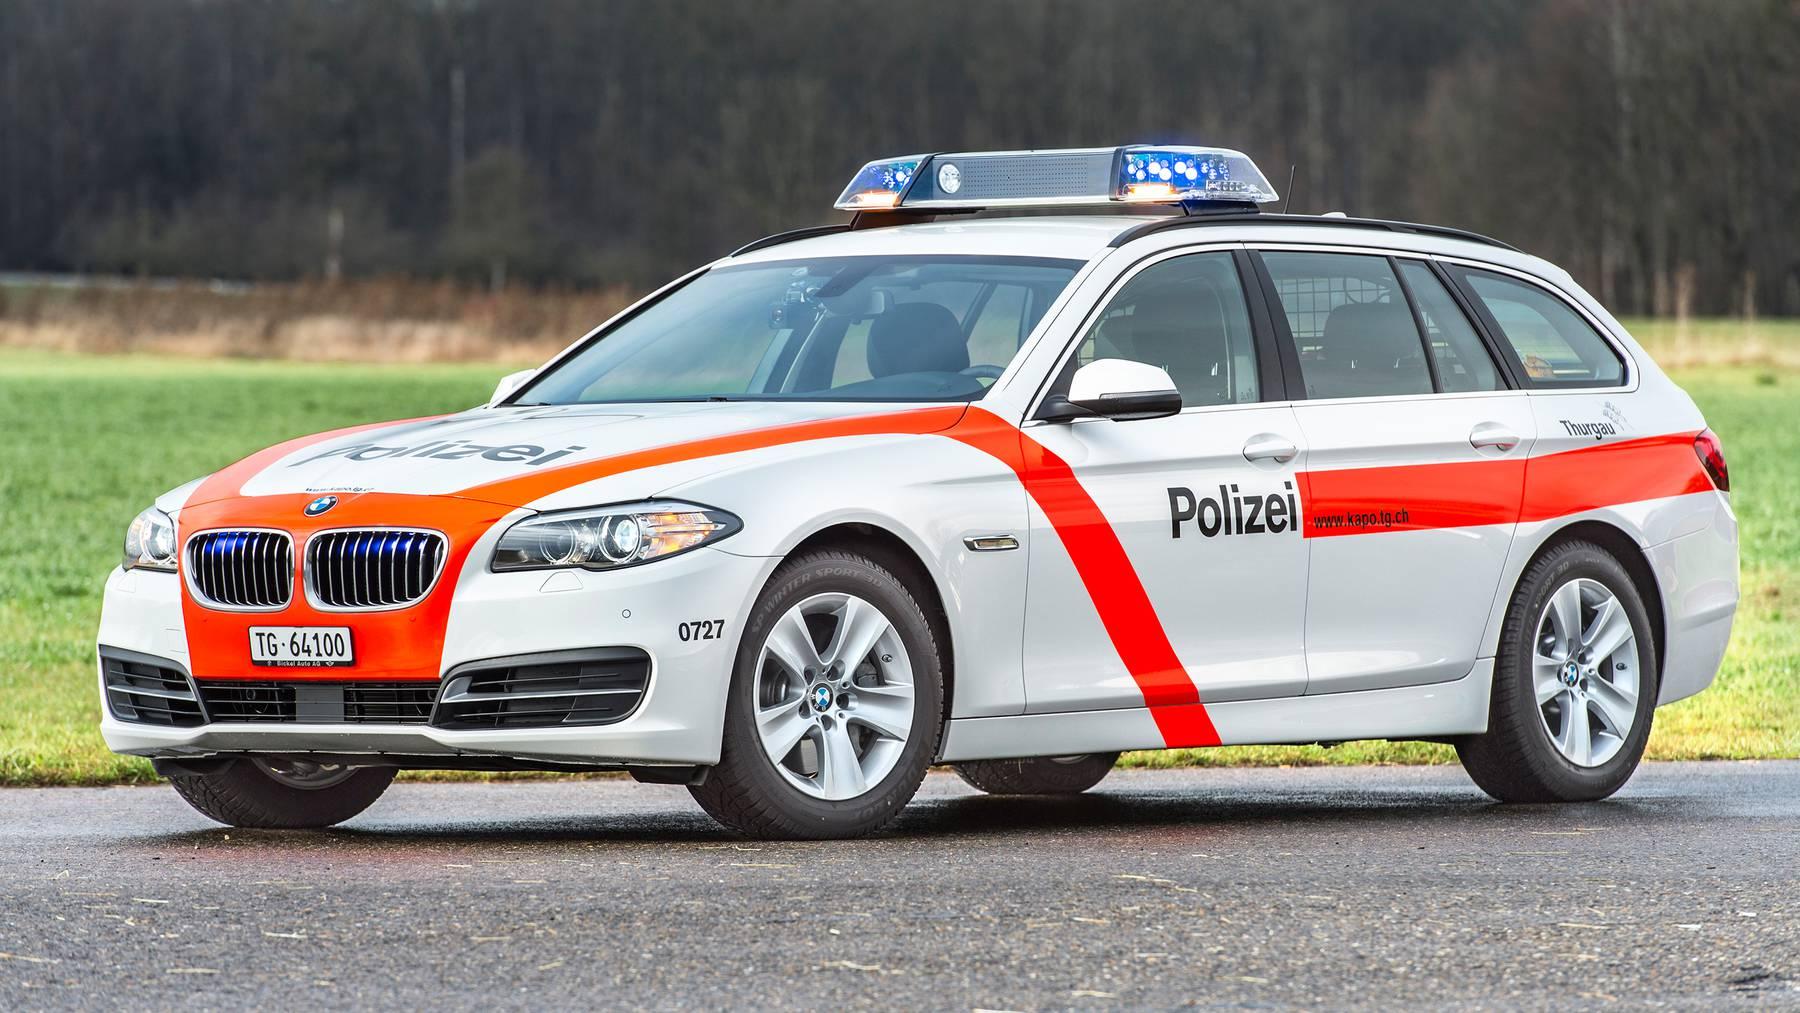 KAPO TG_Symbolbild Polizeifahrzeug 1